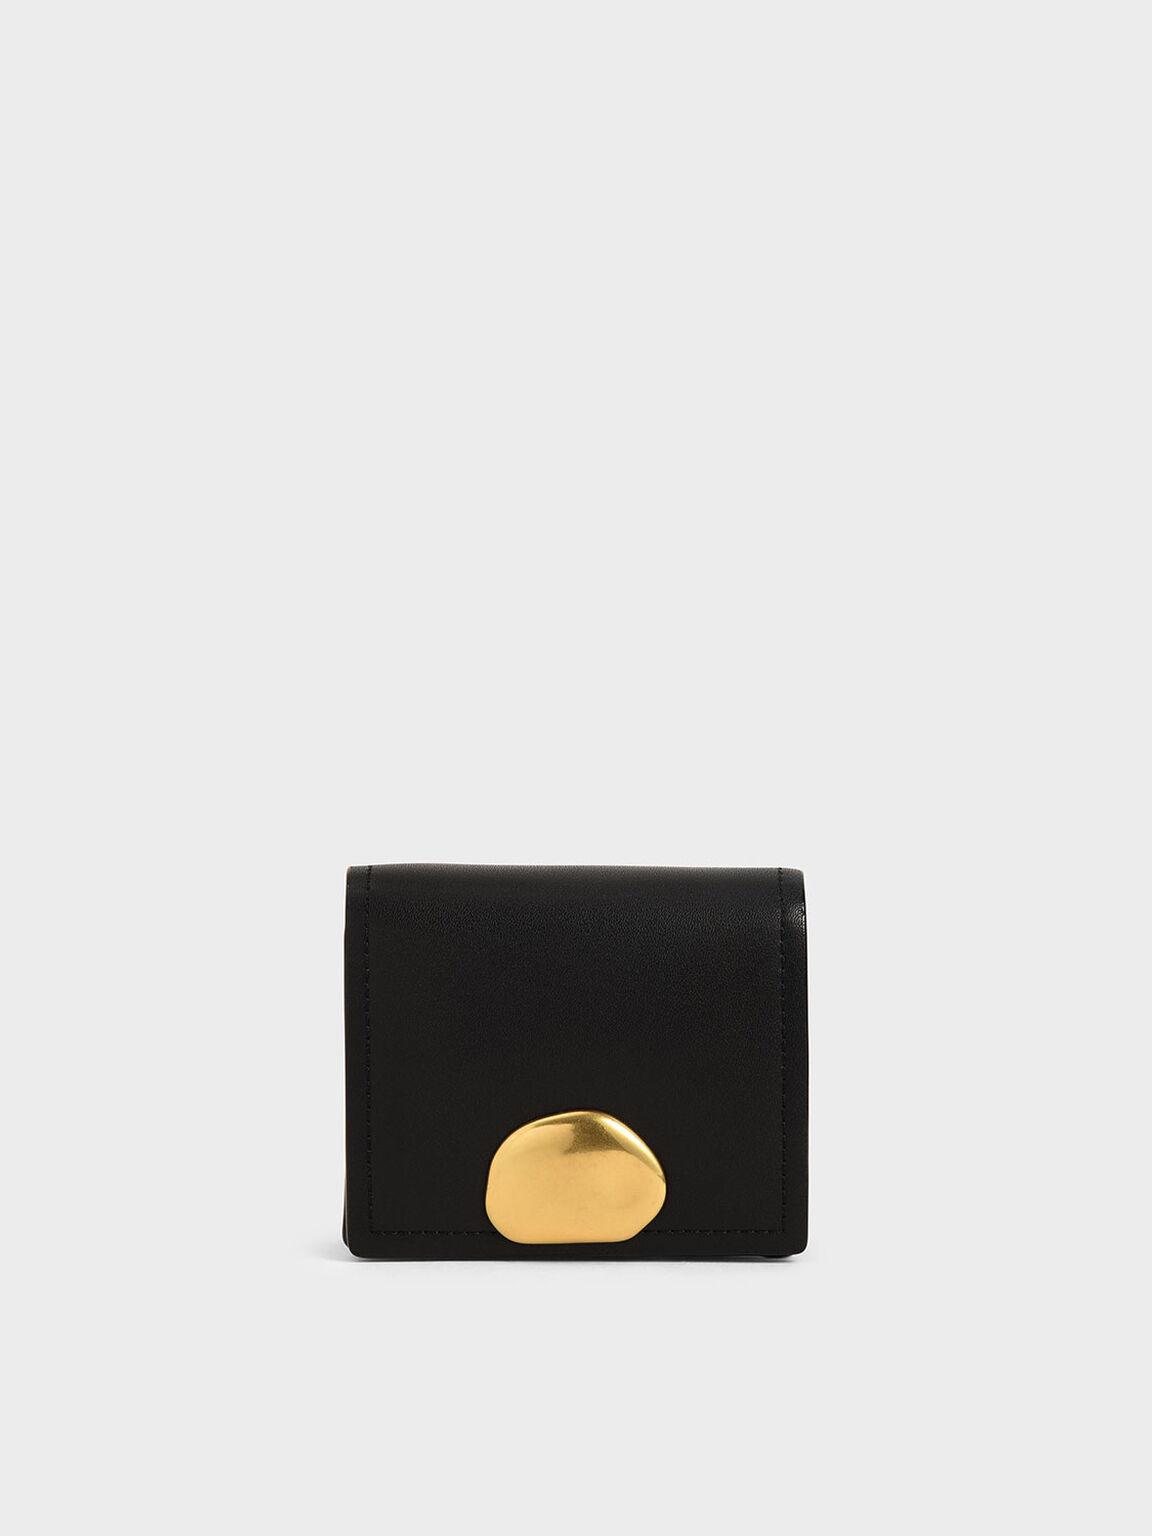 Metallic Accent Snap Button Card Holder, Black, hi-res